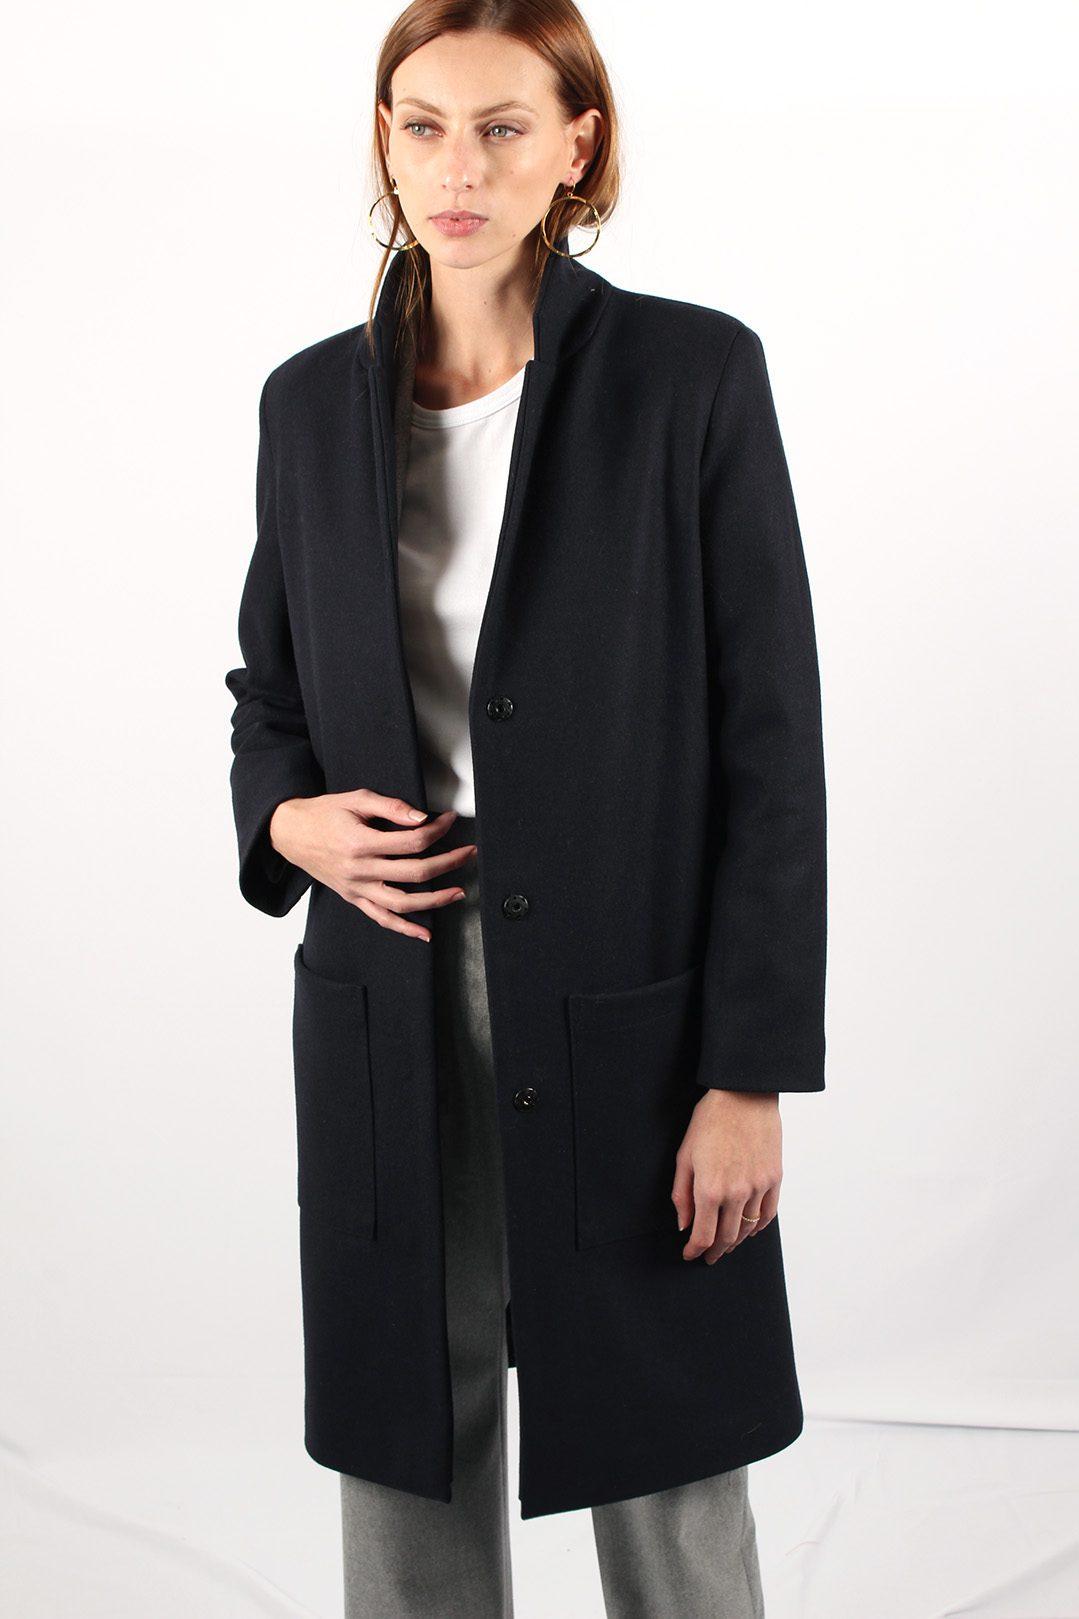 Manteau Oversize en laine bleue marine Made in France | ATODE